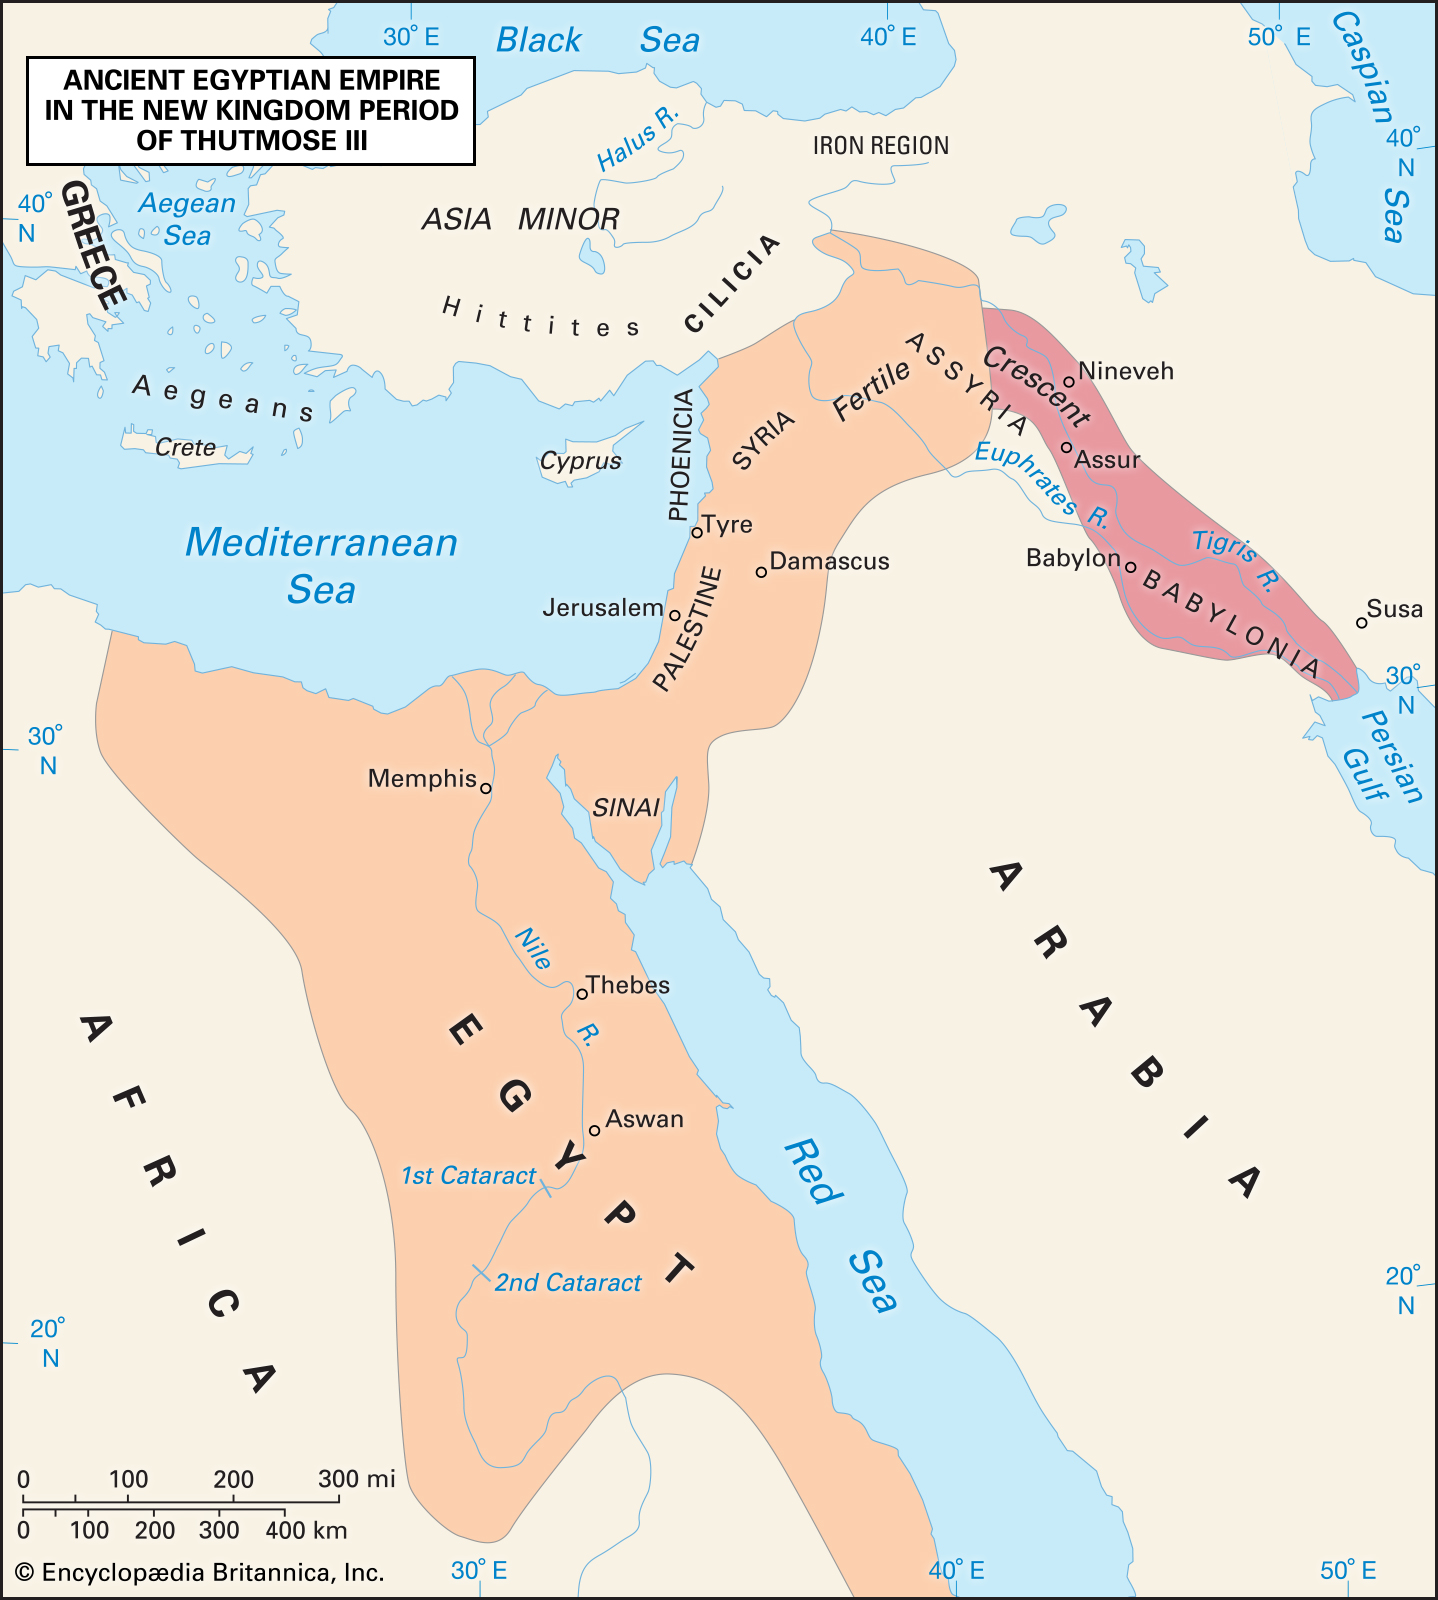 Egypt under Thutmose III